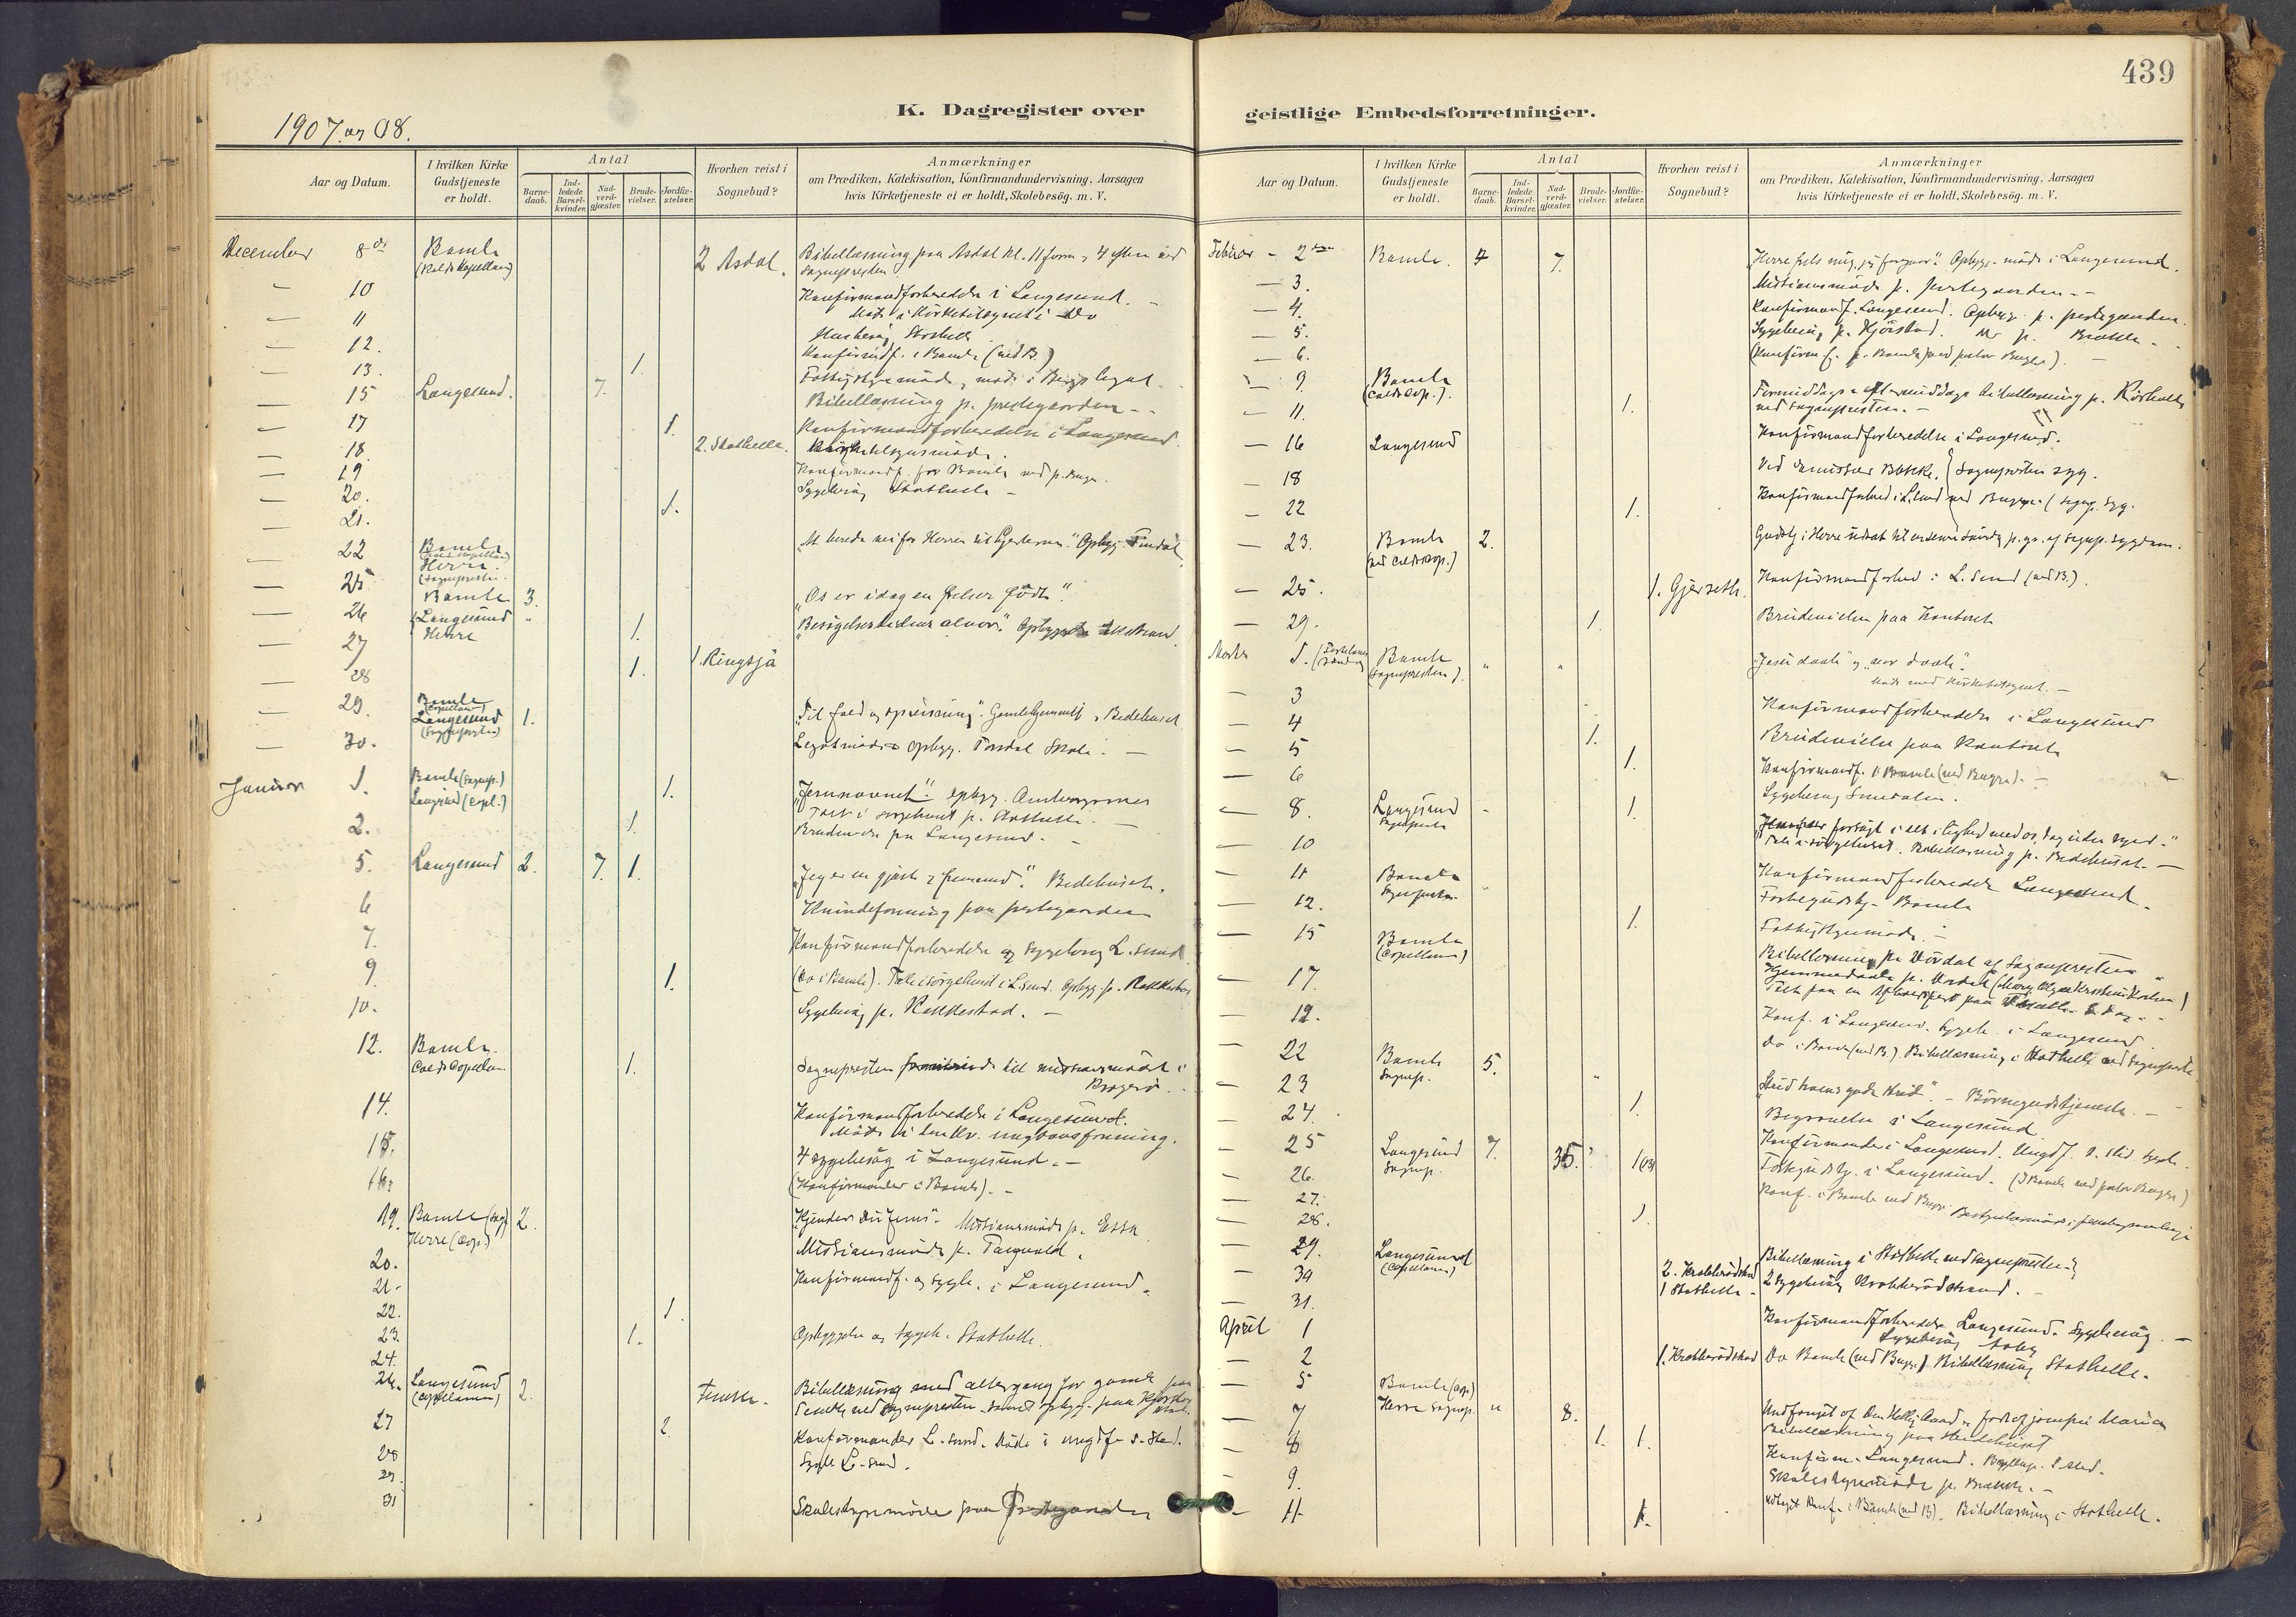 SAKO, Bamble kirkebøker, F/Fa/L0009: Ministerialbok nr. I 9, 1901-1917, s. 439